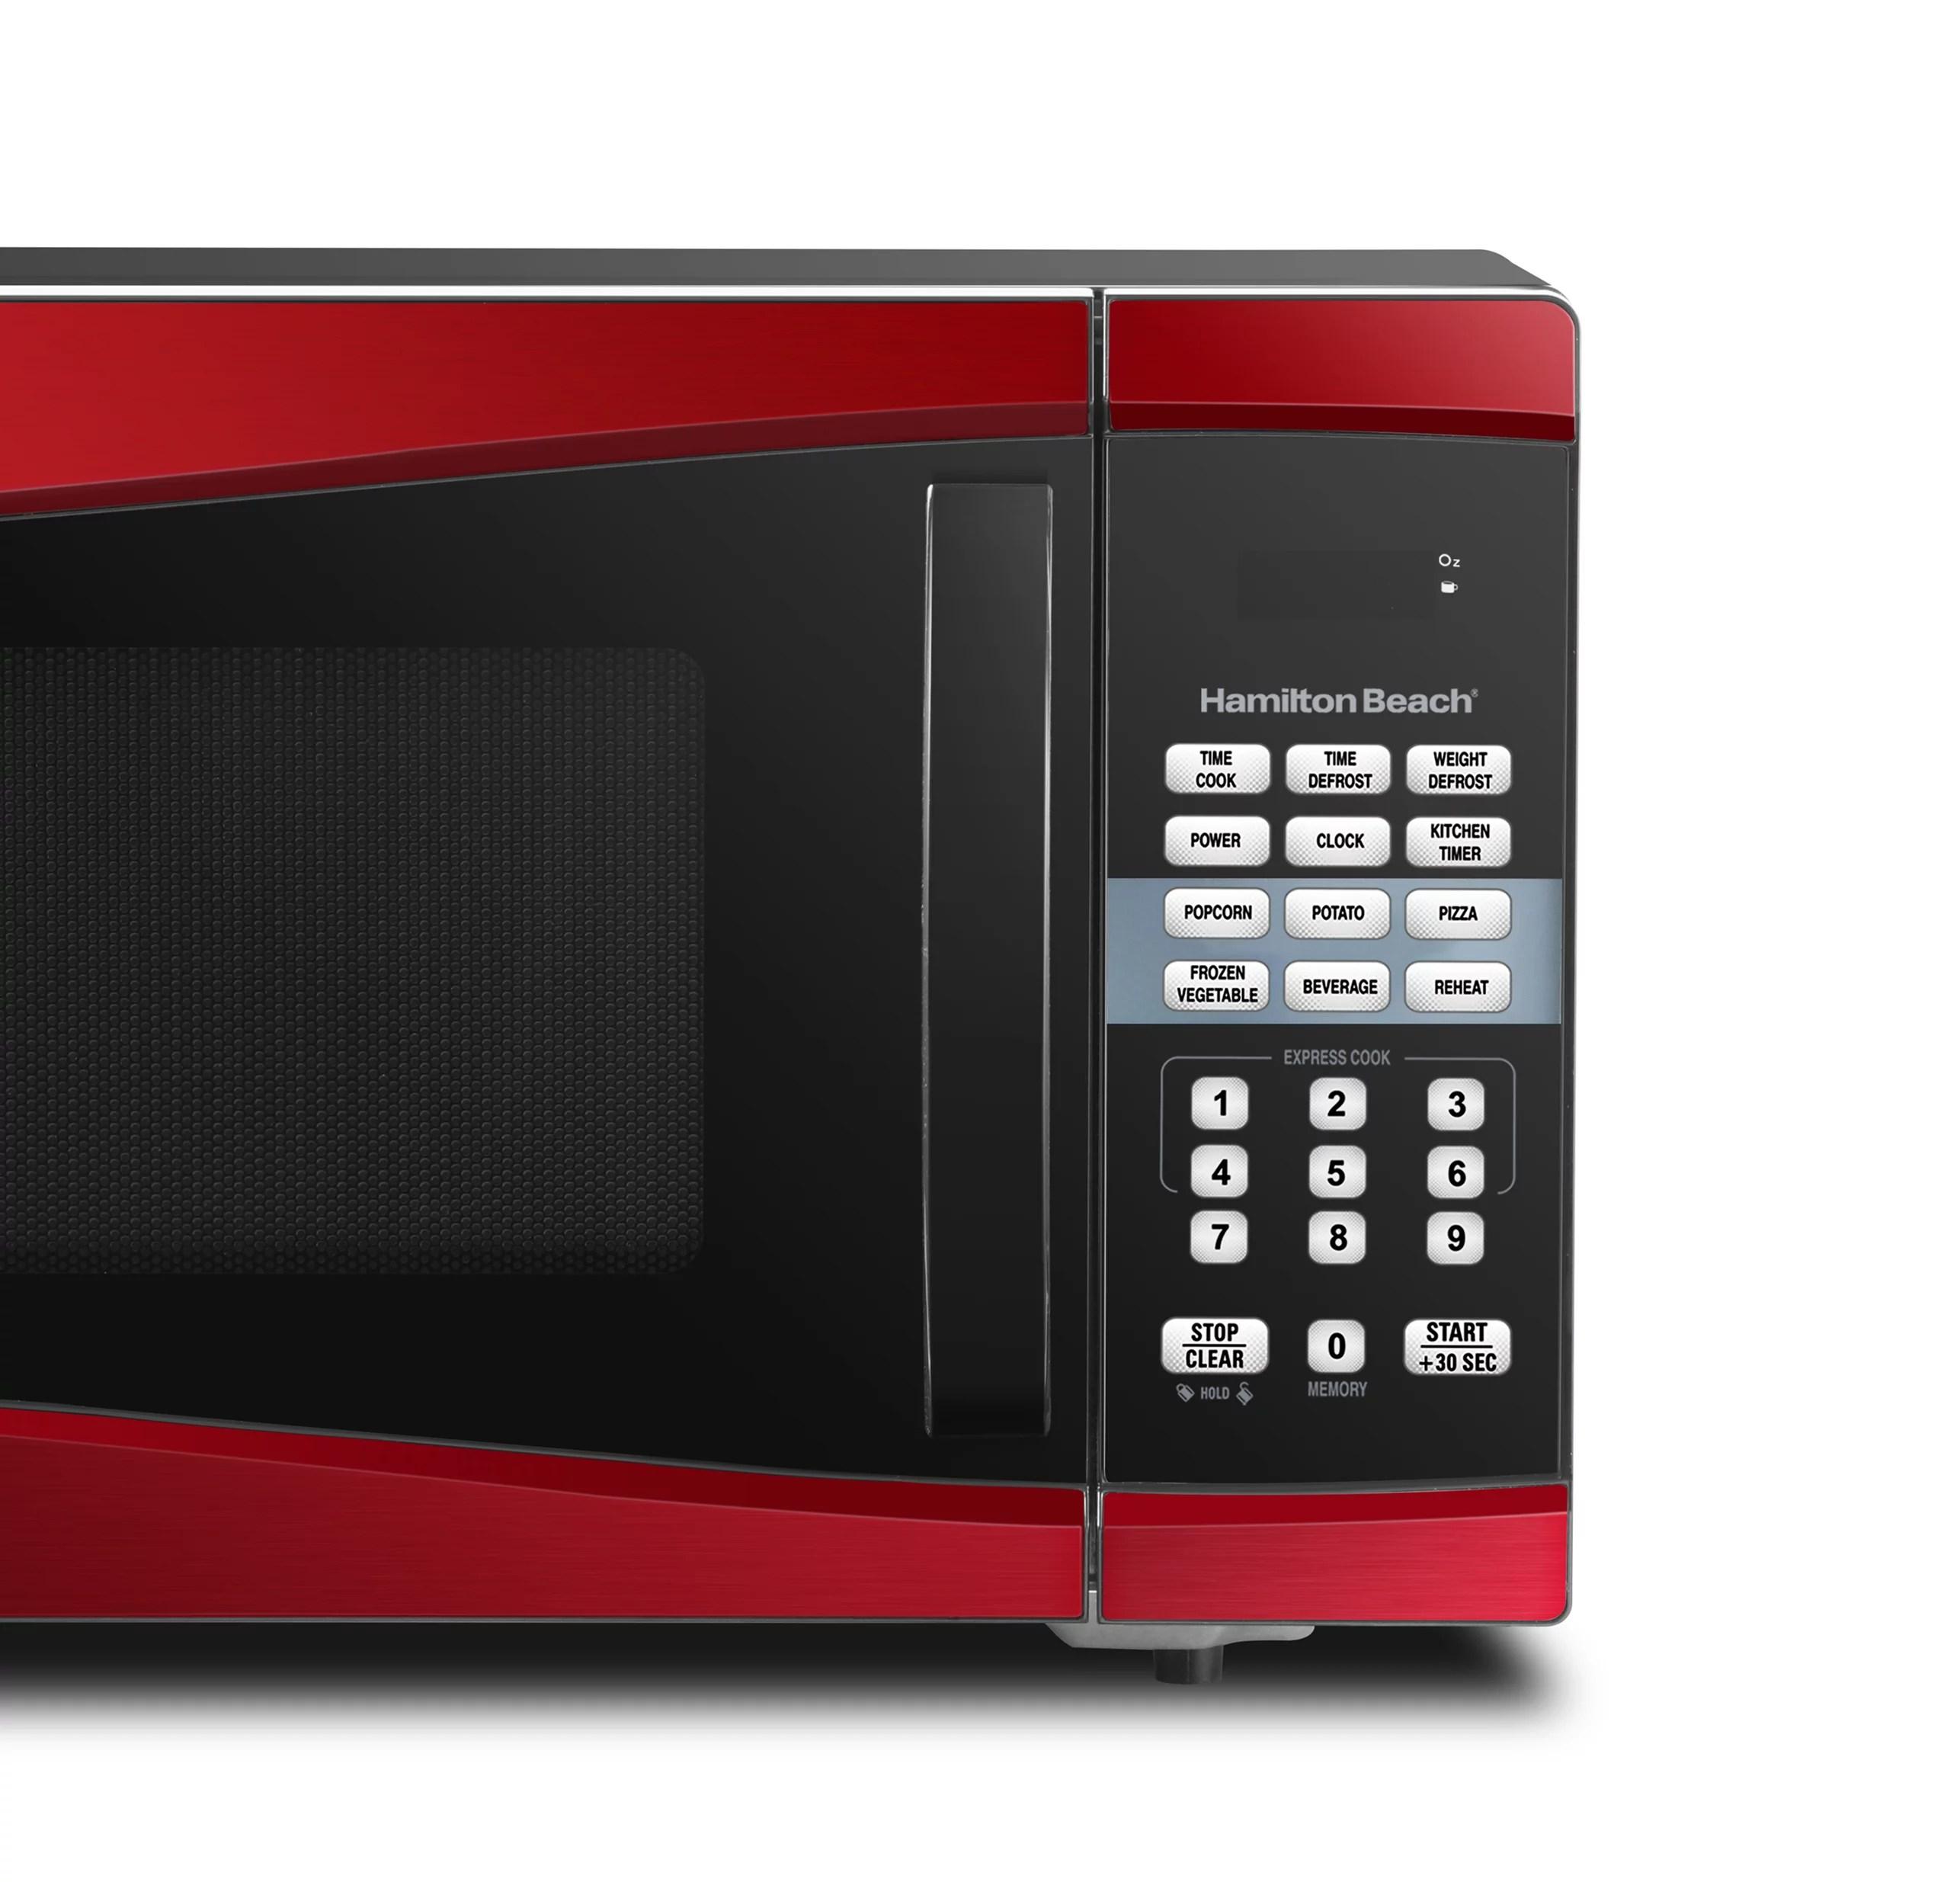 hamilton beach 0 9 cu ft 900w red microwave